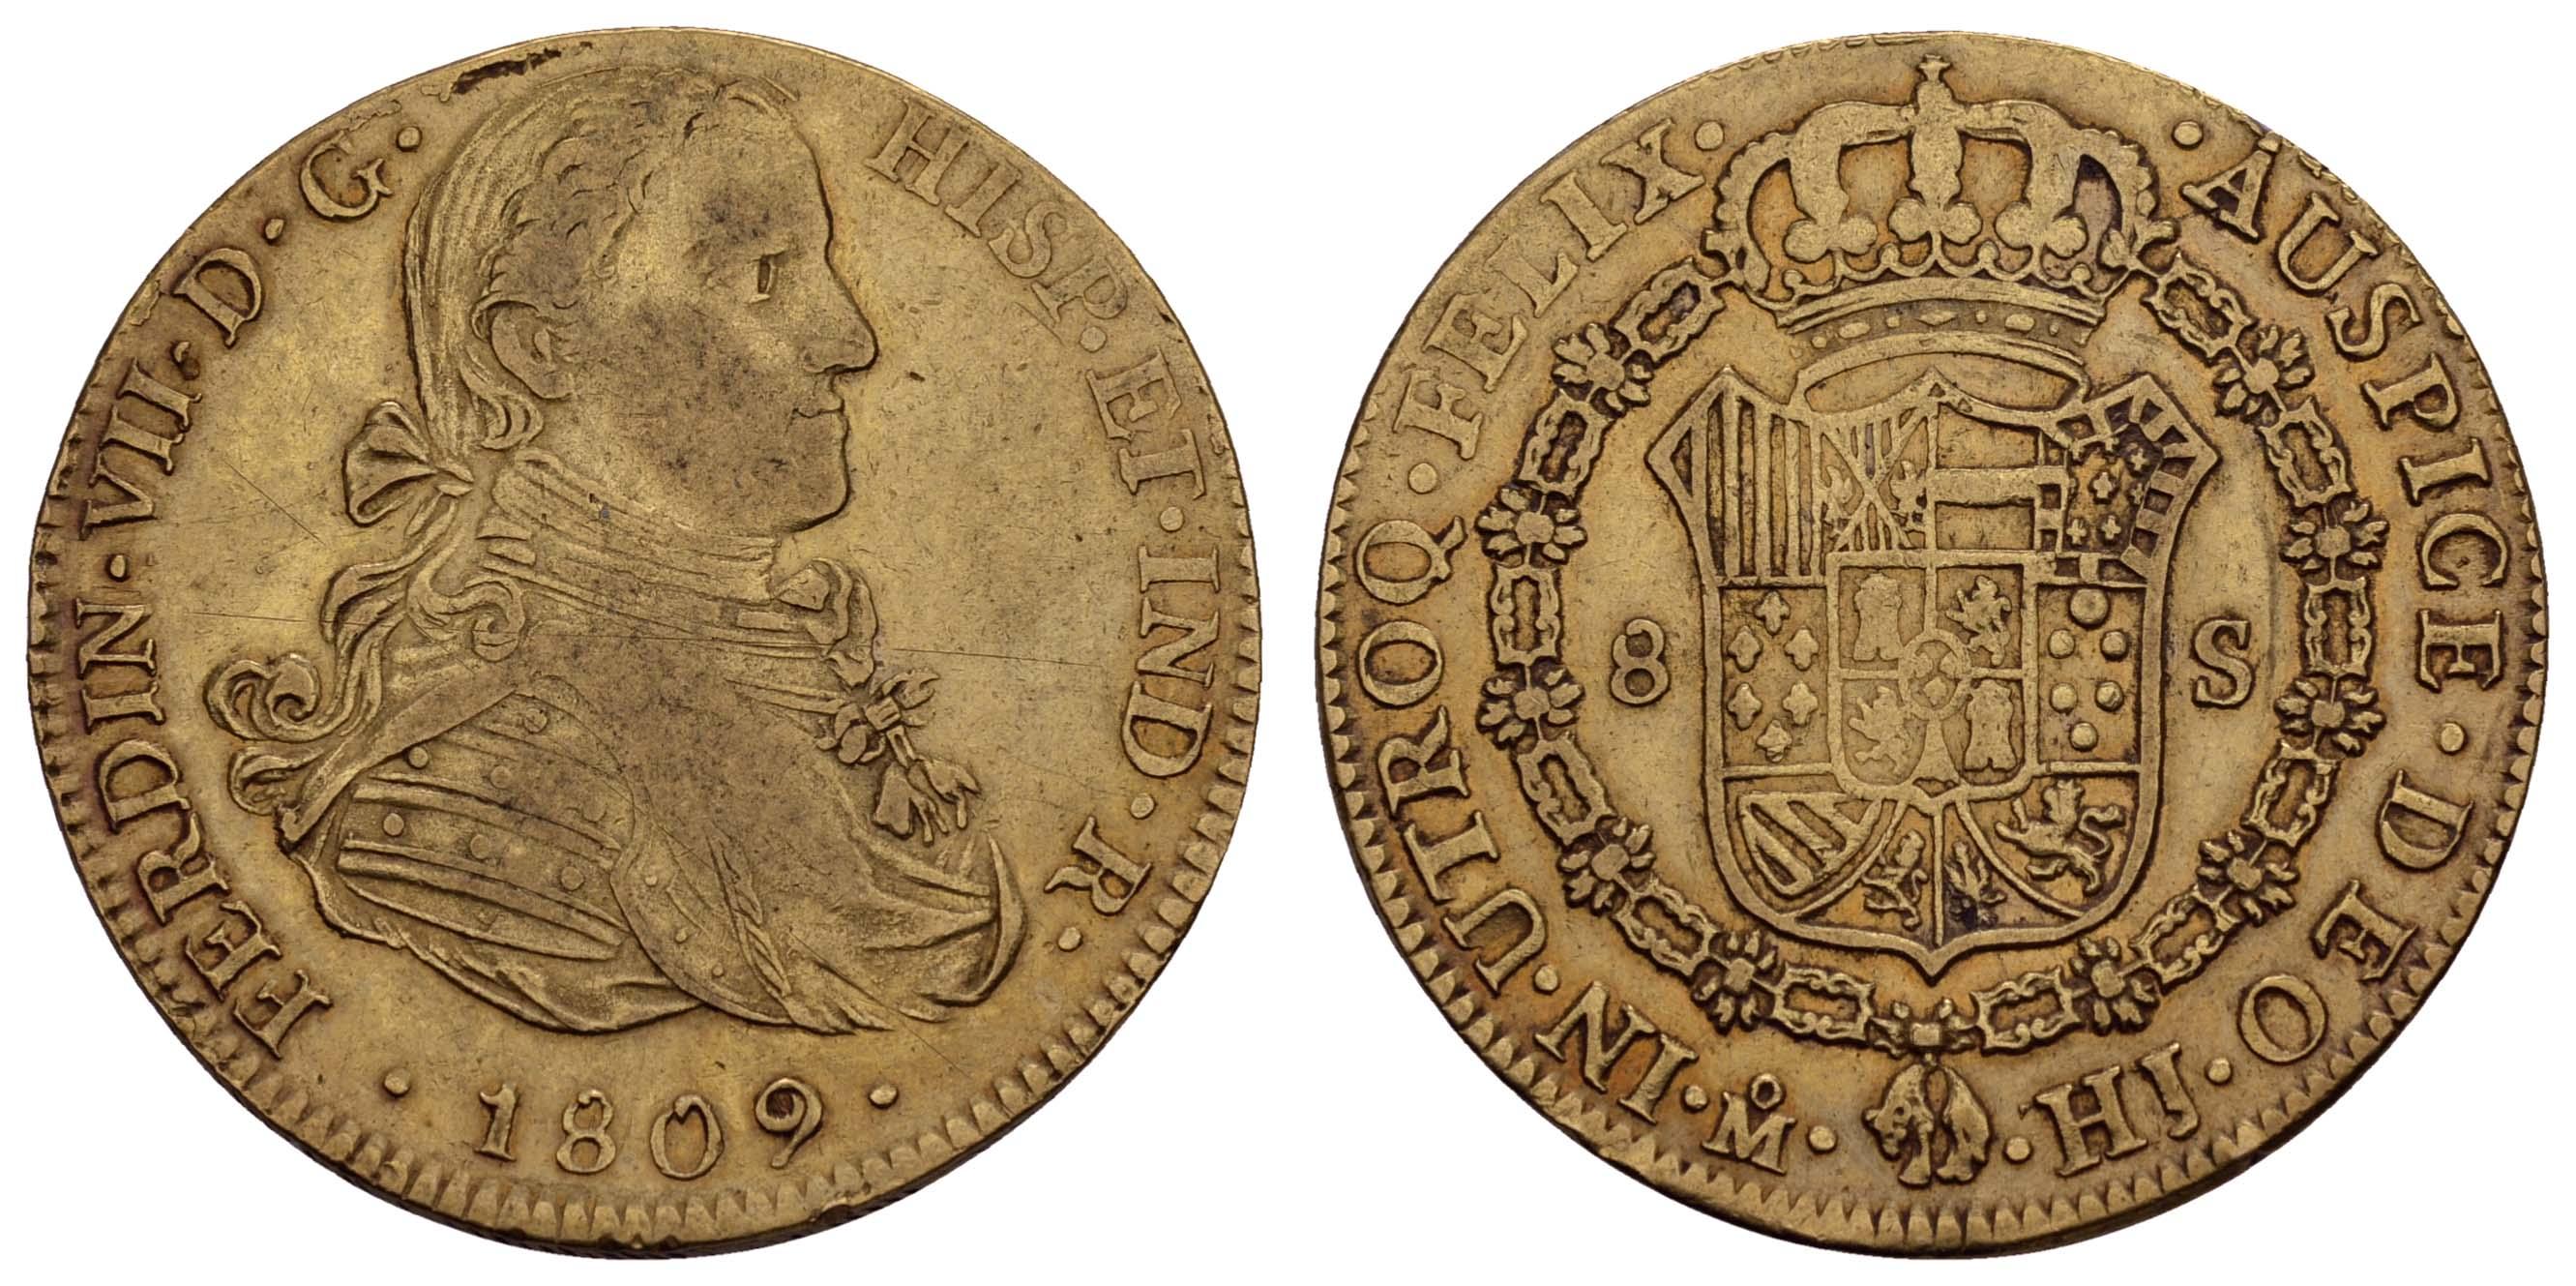 Lot 2067 - übersee mexiko -  Auktionshaus Ulrich Felzmann GmbH & Co. KG Coins single lots